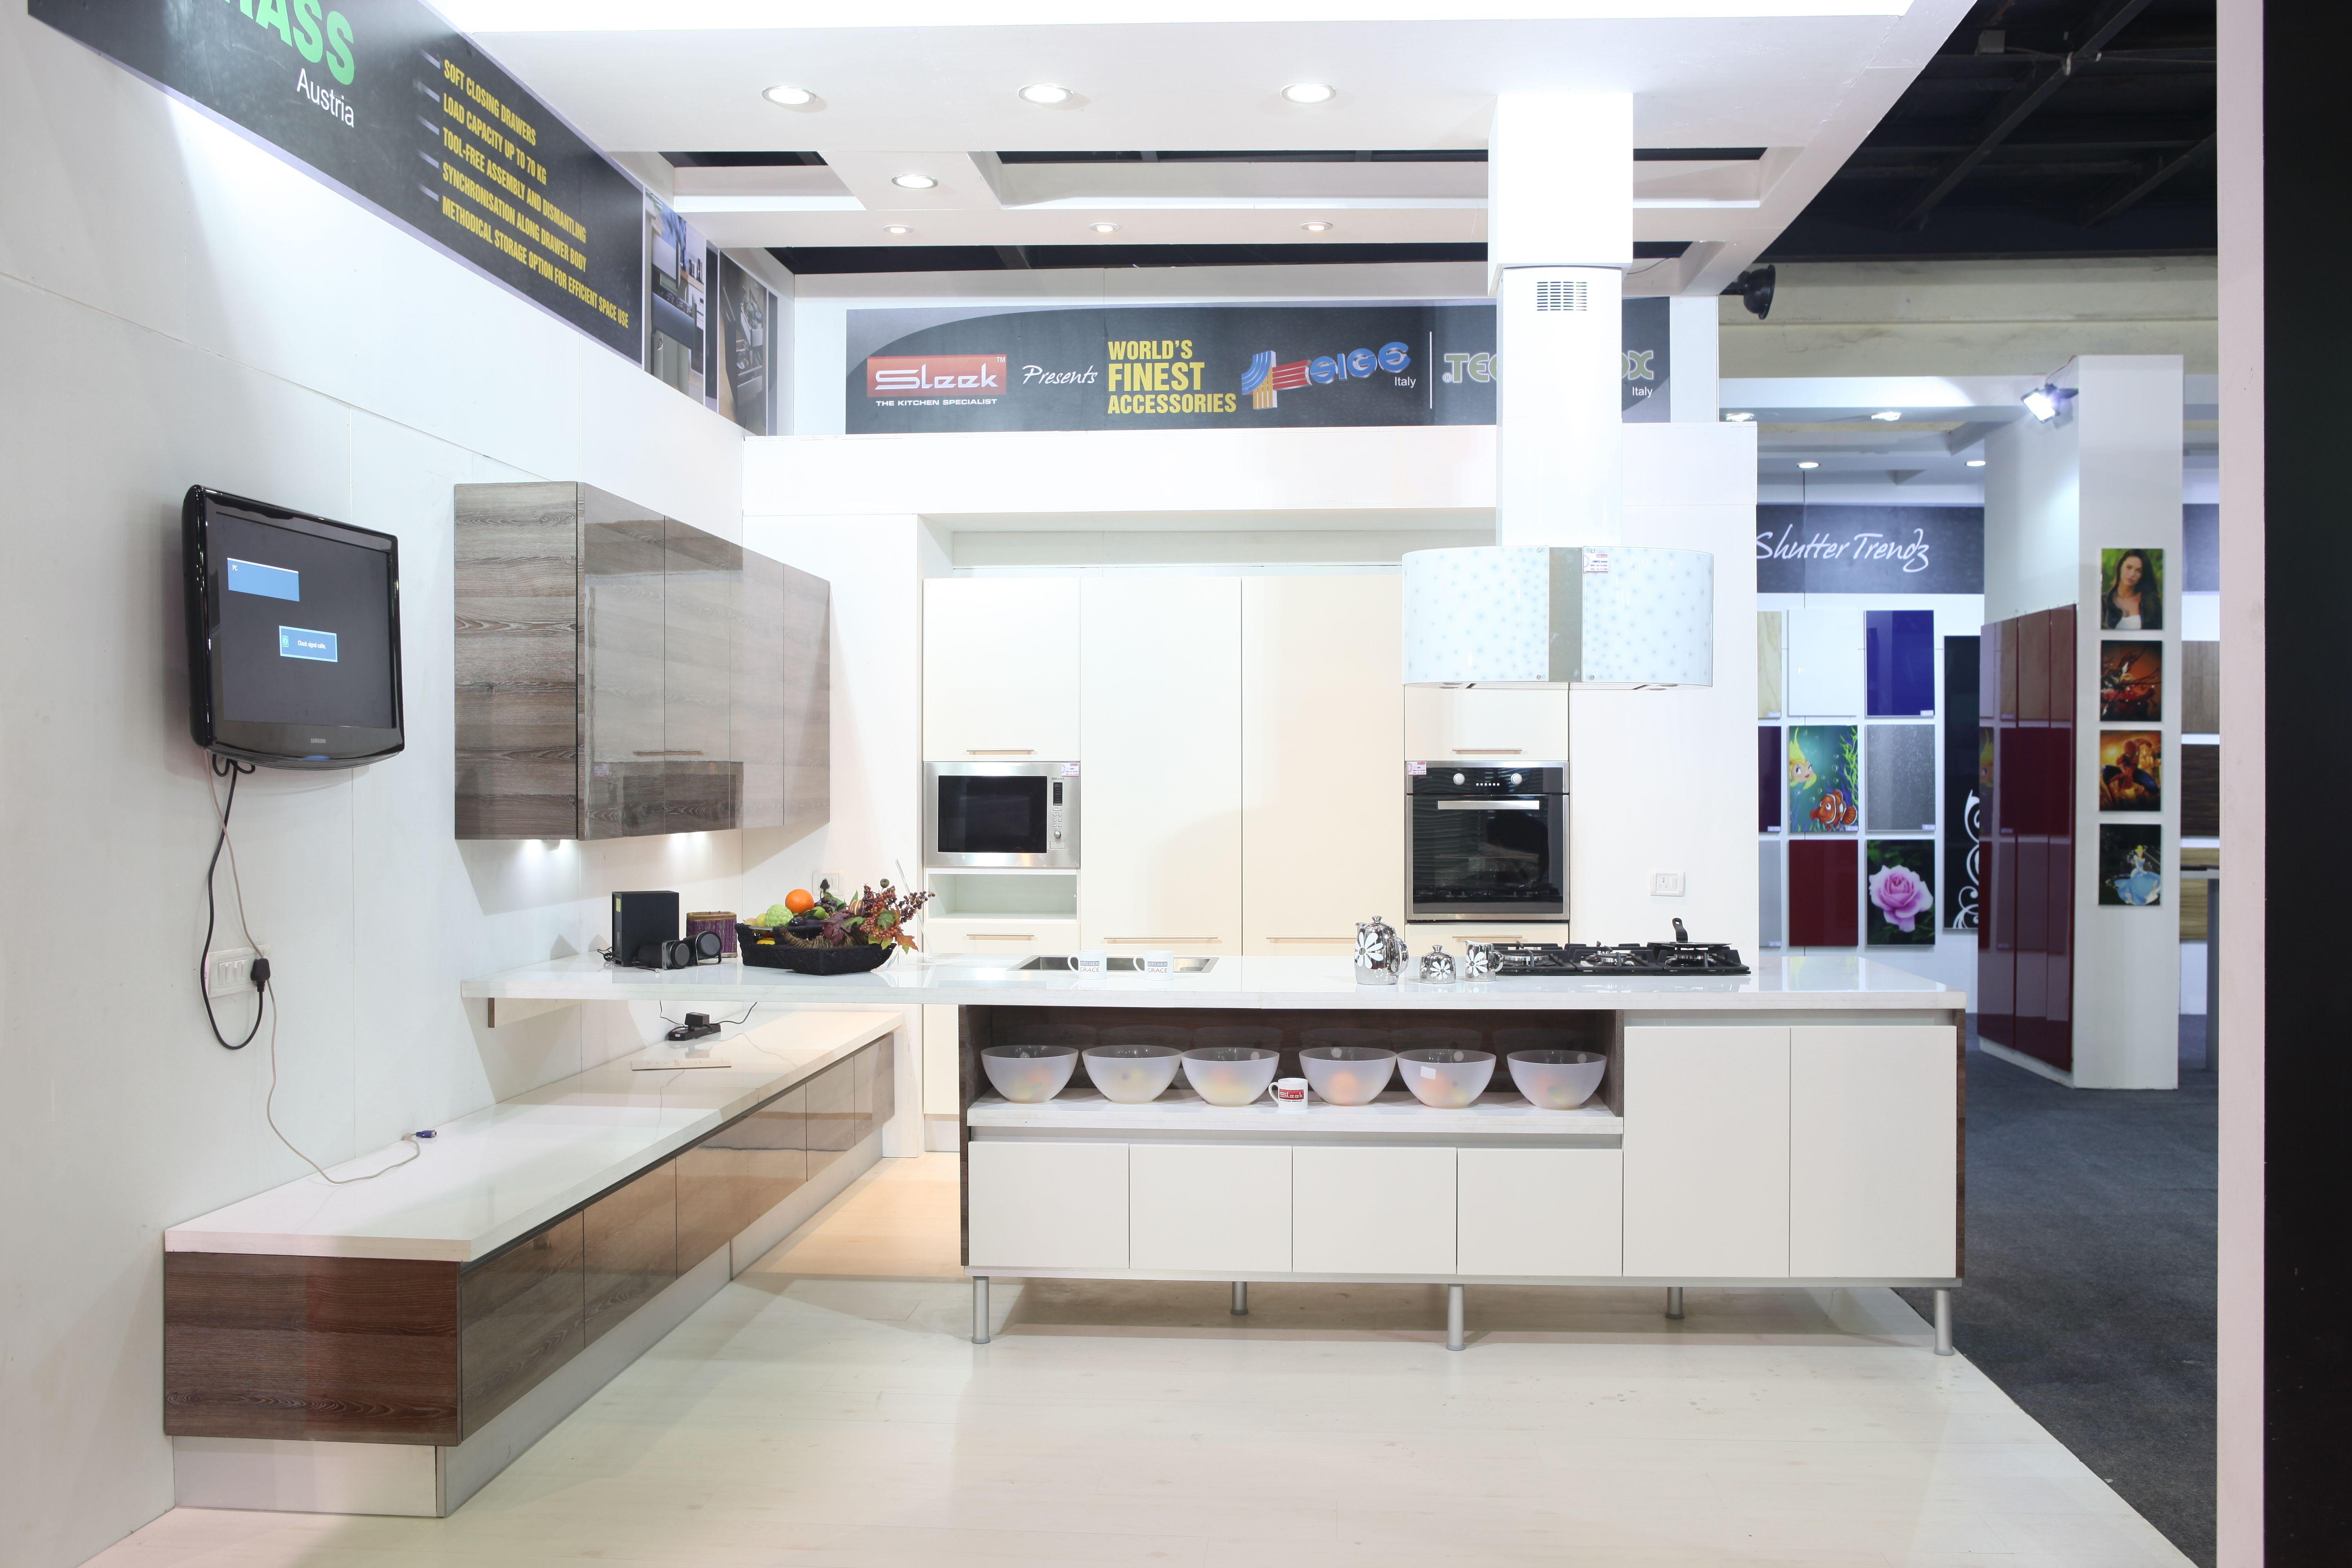 Http://www.sleekkitchens.com/modular Kitchen/ Offers Bringing Part 74